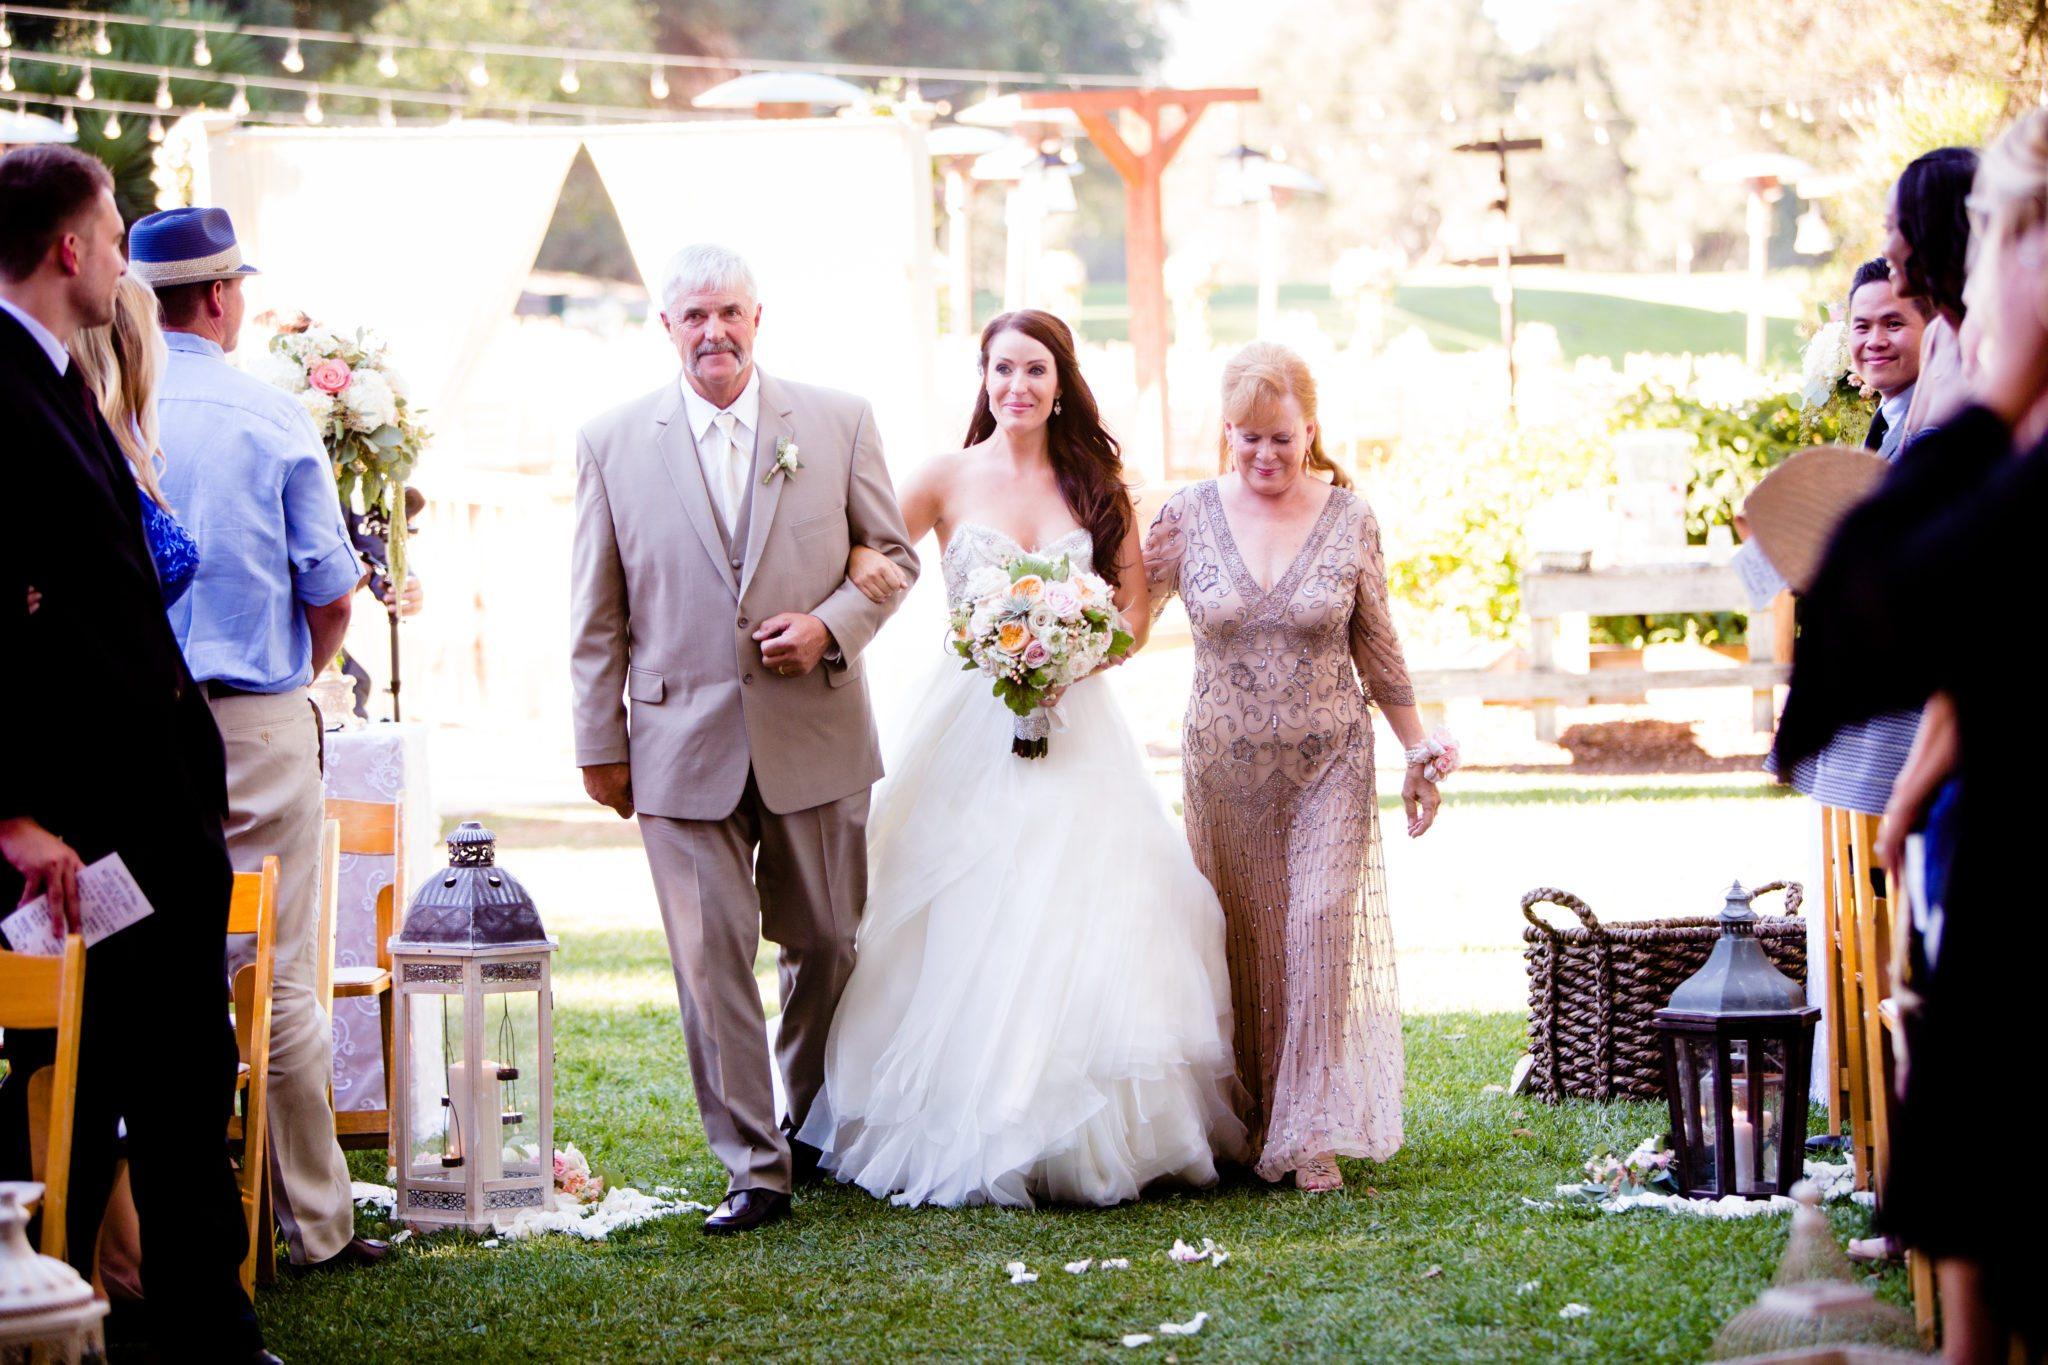 Temecula_Creek_Inn_Wedding_076.jpg